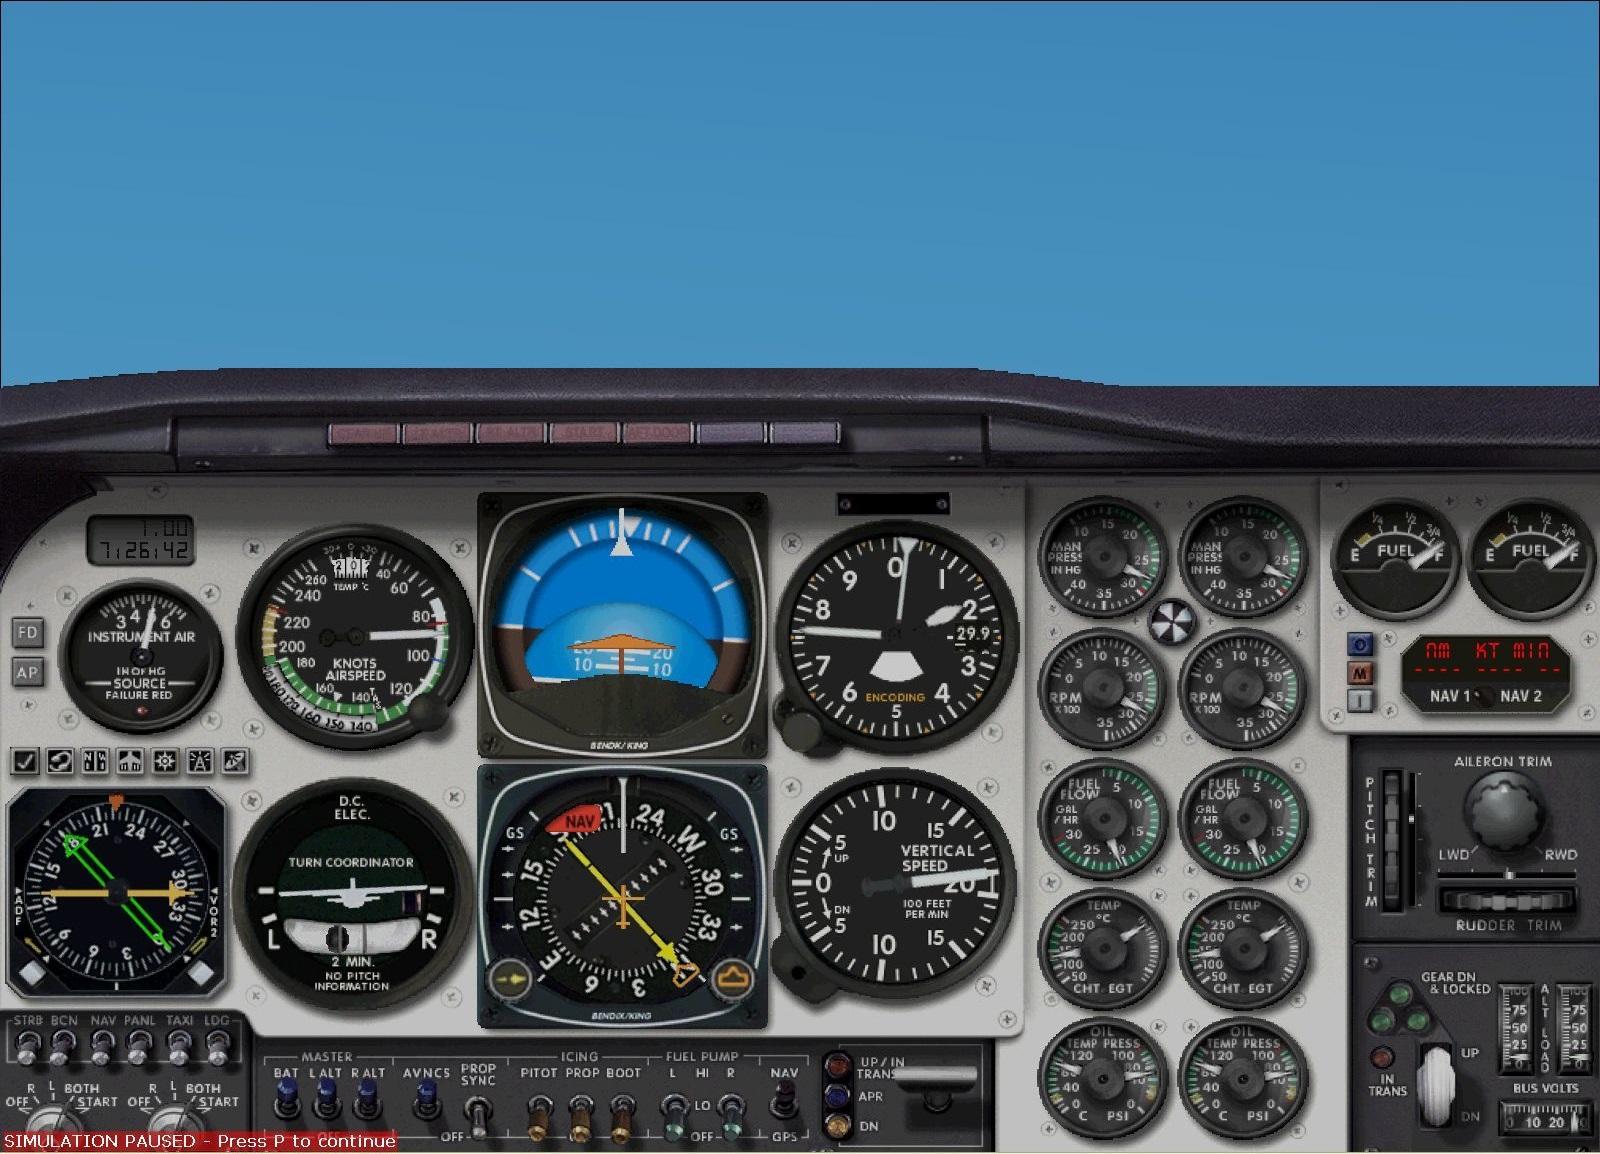 Microsoft Flight Simulator 2002: Professional Edition